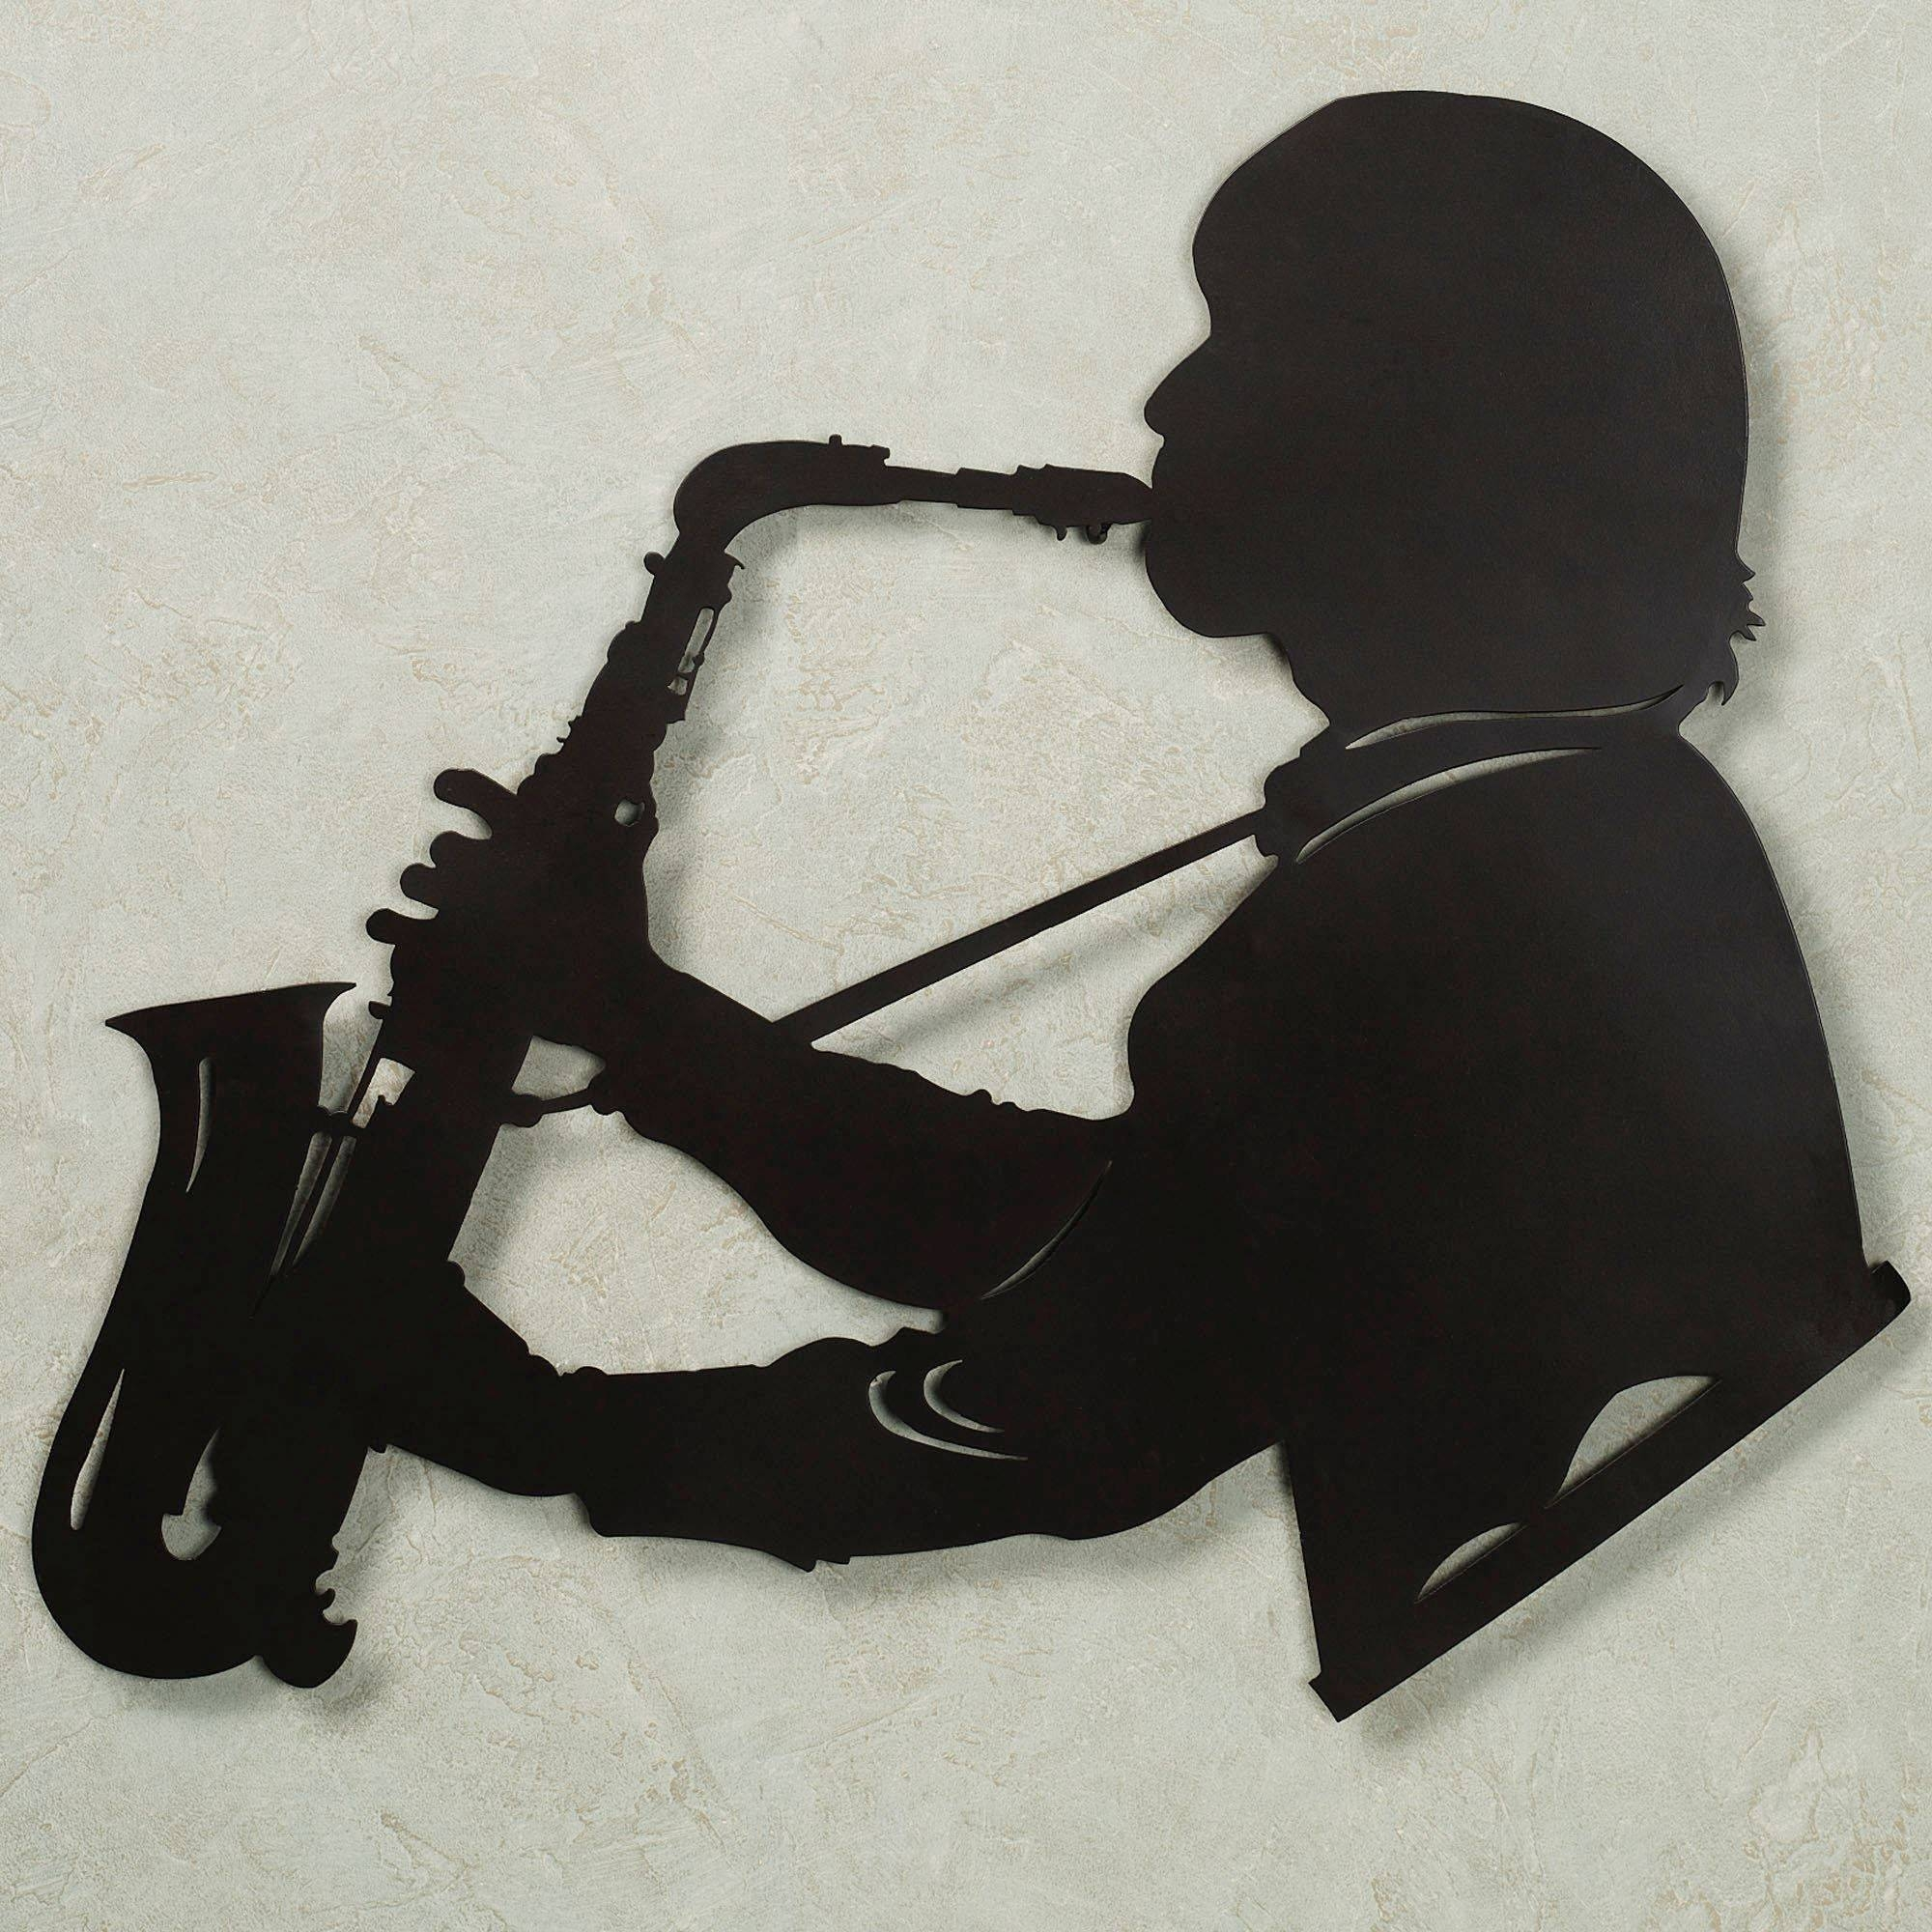 Saxophone Vibes Metal Wall Art Regarding Latest Jazz Metal Wall Art (View 11 of 20)